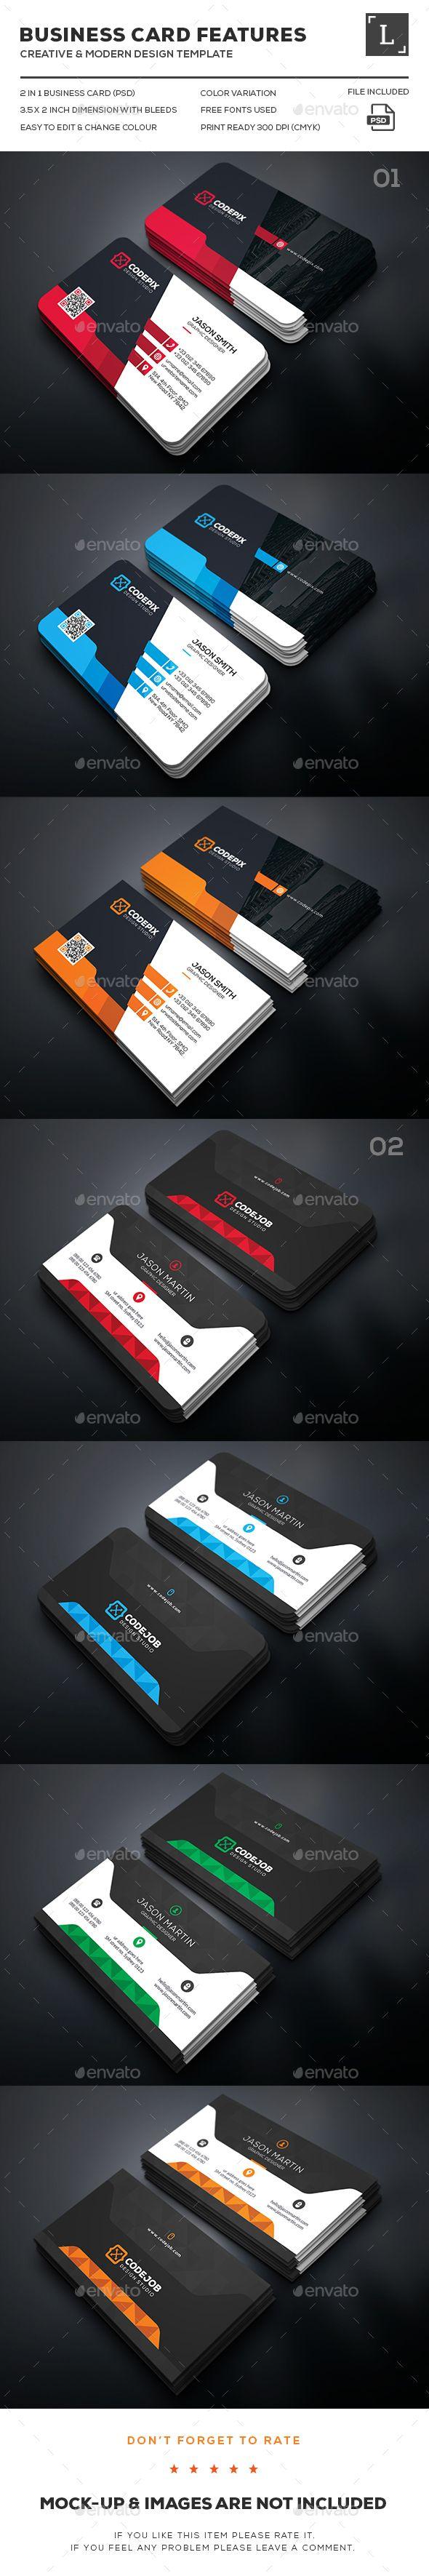 208 Best Business Cards Images On Pinterest Business Card Design